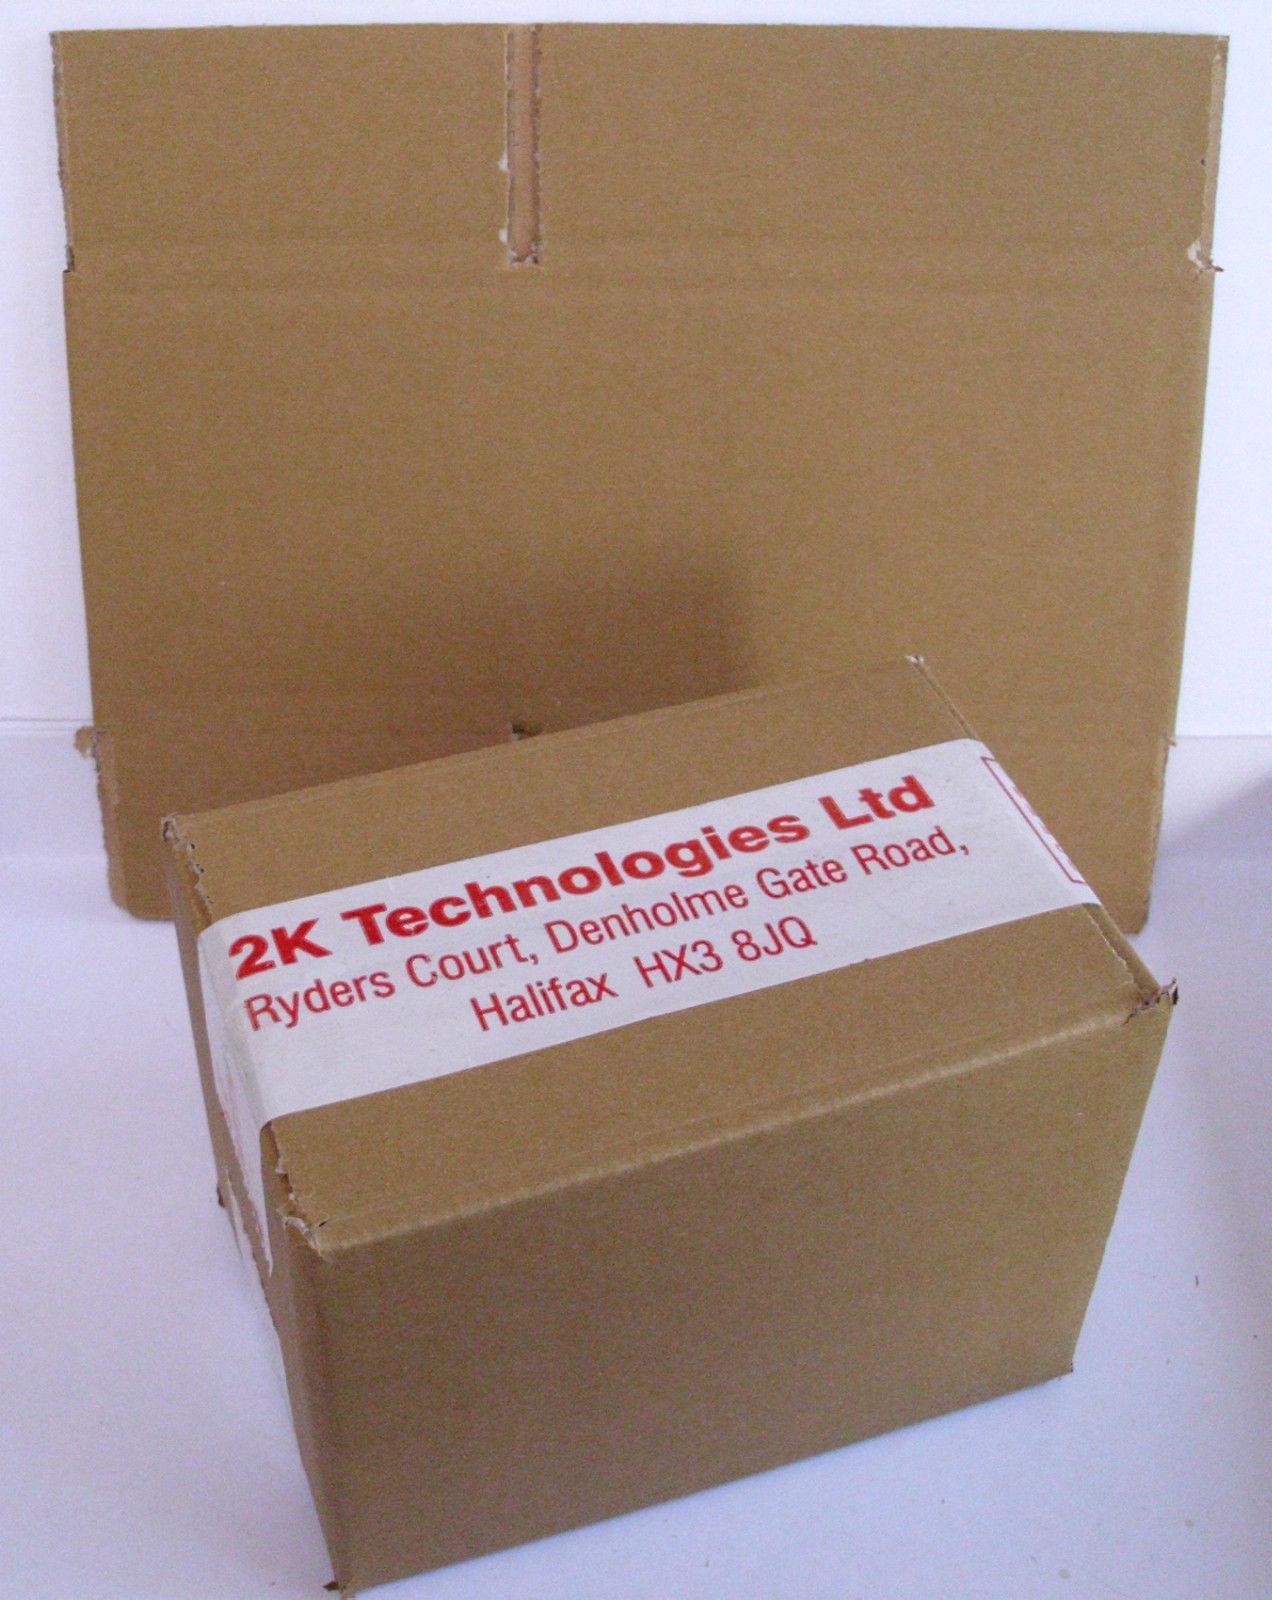 Postal Boxes Archives - 2K Technologies